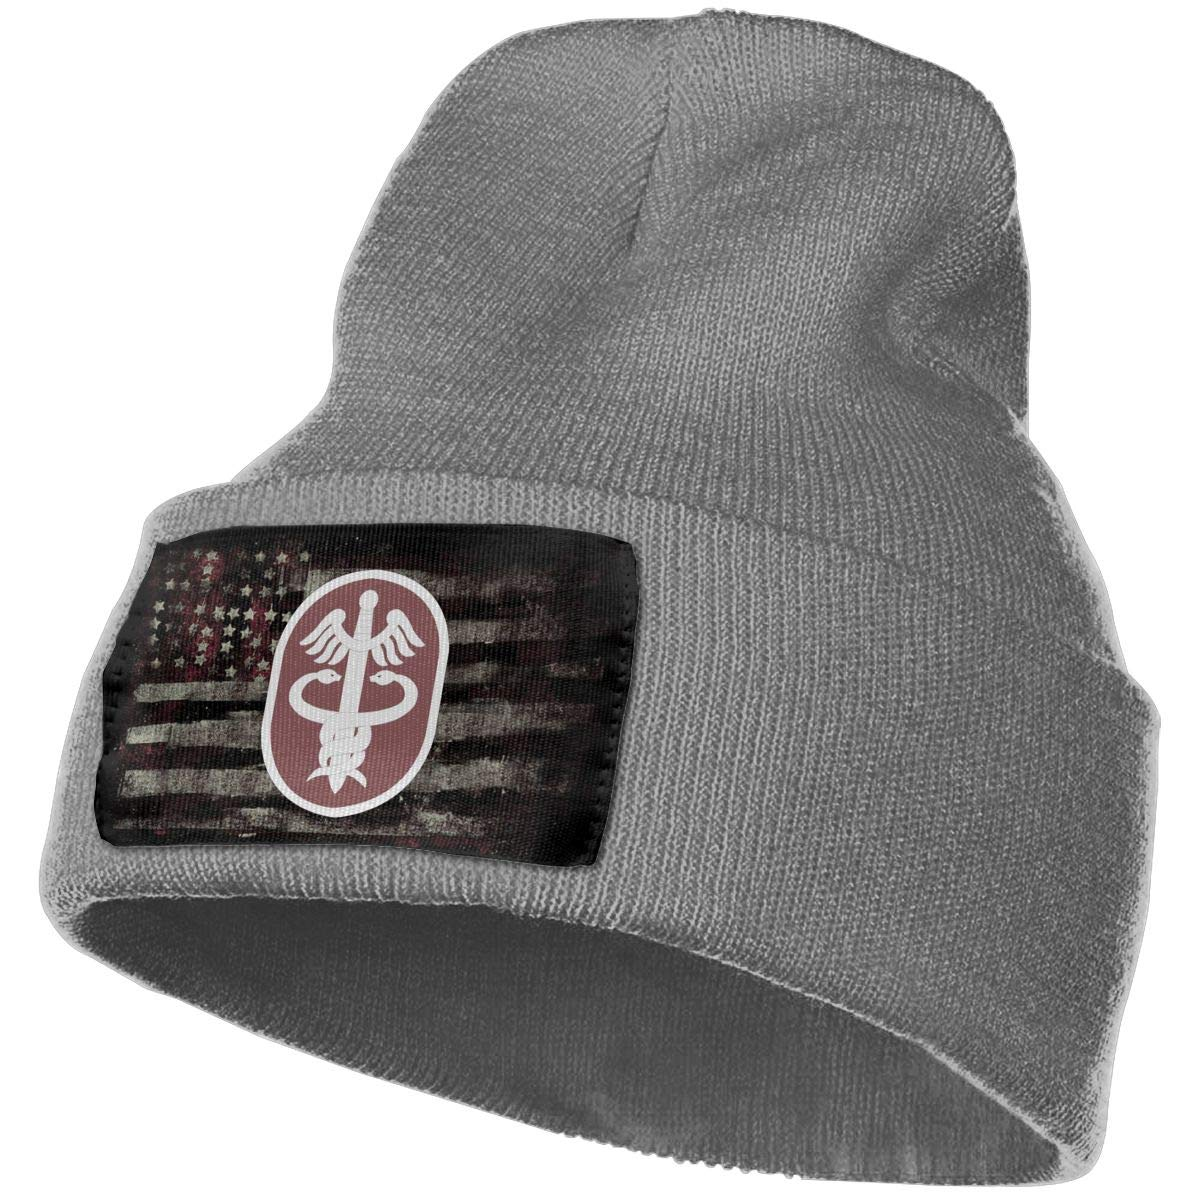 US Army Medical Command Mens Beanie Cap Skull Cap Winter Warm Knitting Hats.